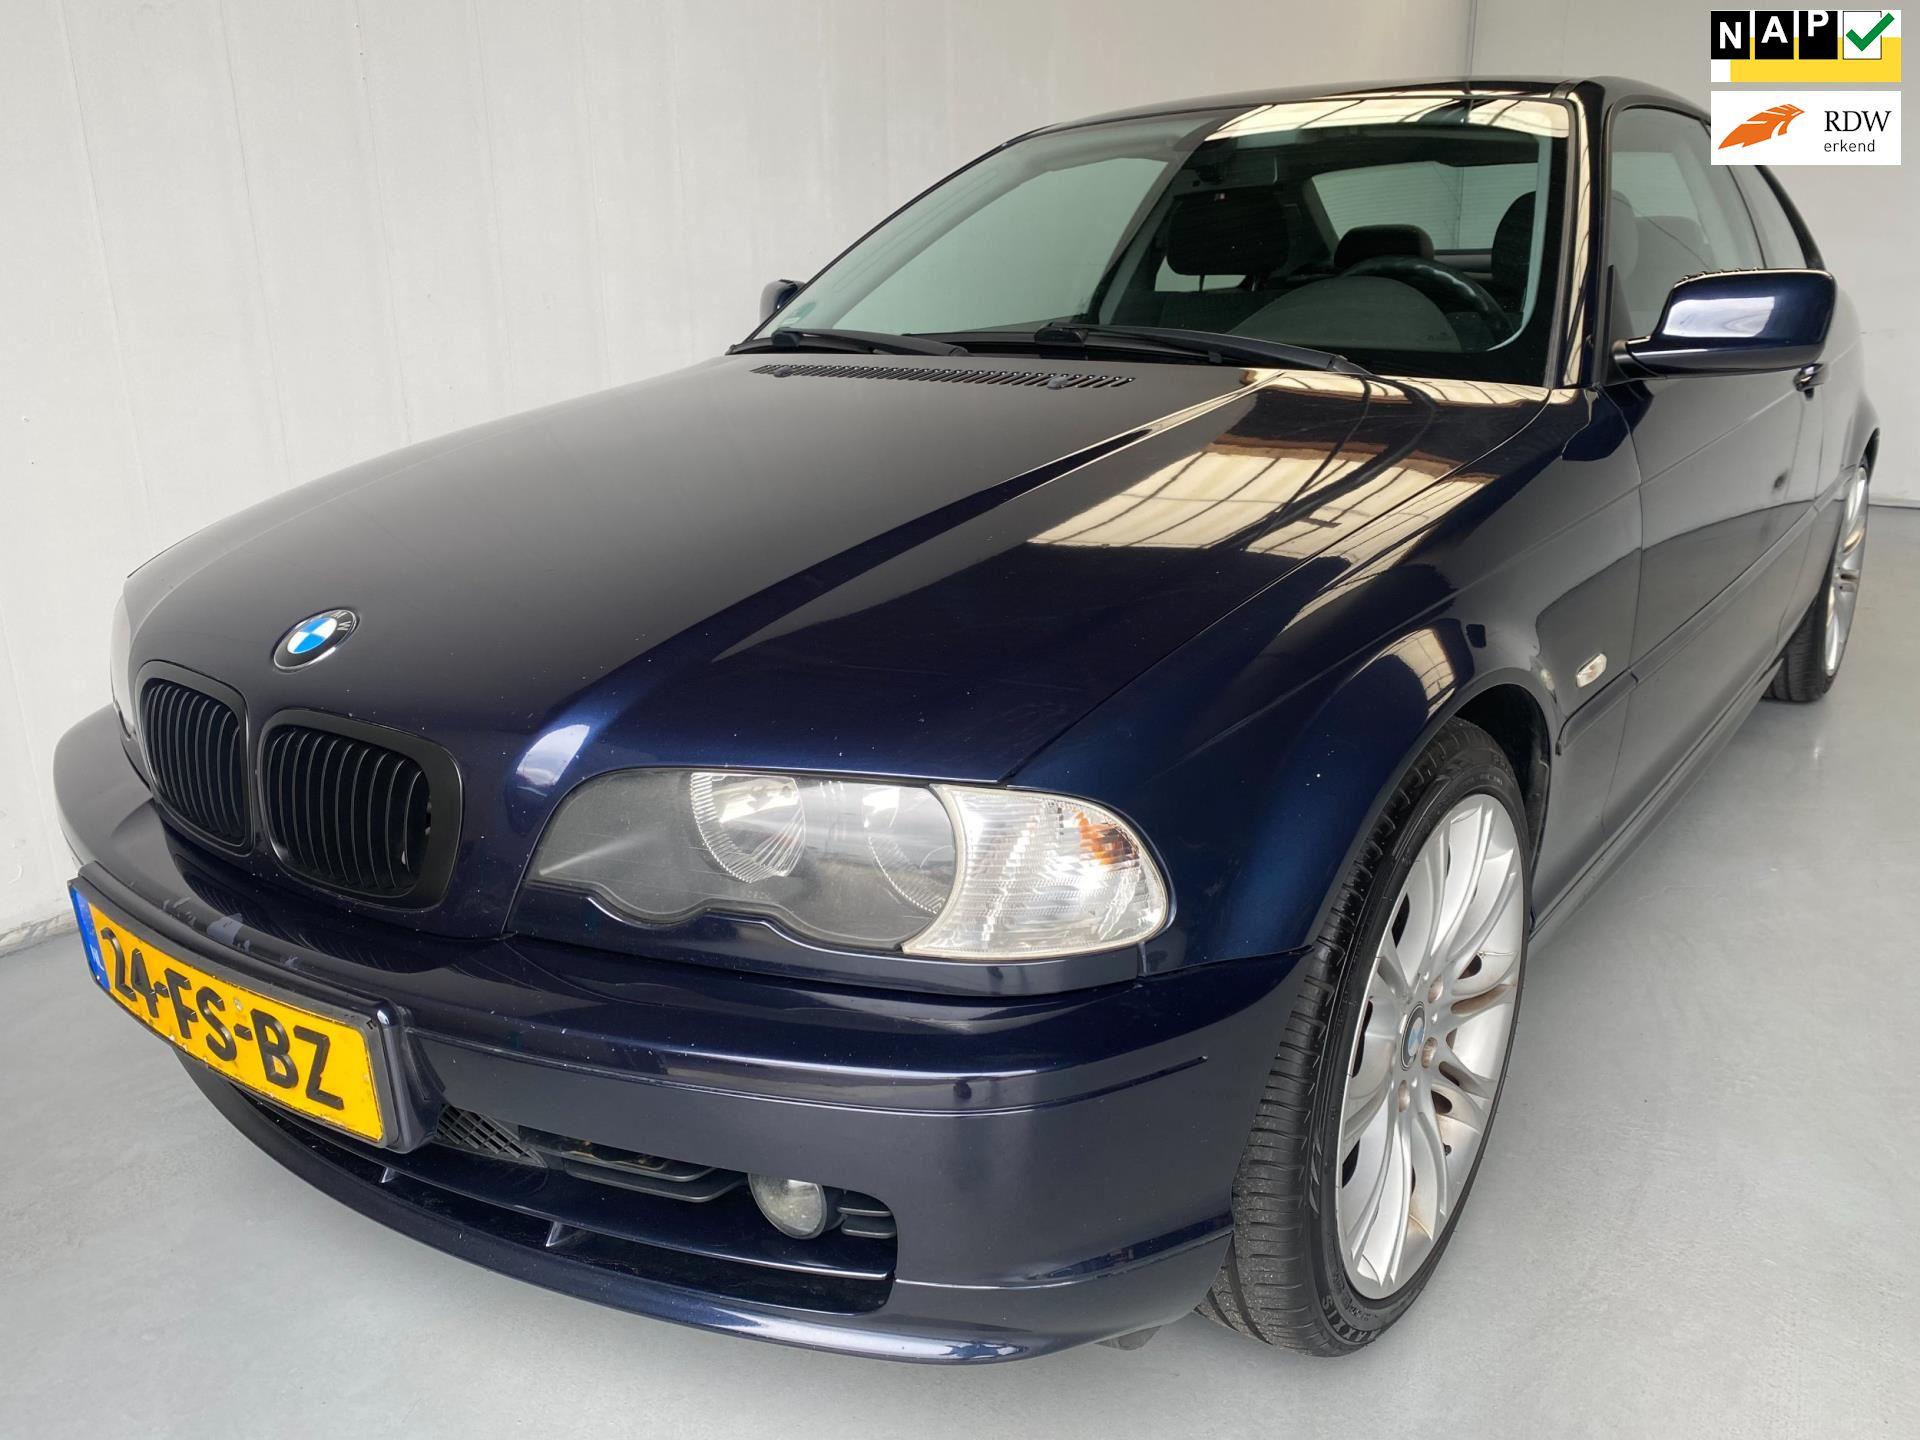 BMW 3-serie Coupé occasion - Autobedrijf Leeuwis B.V.